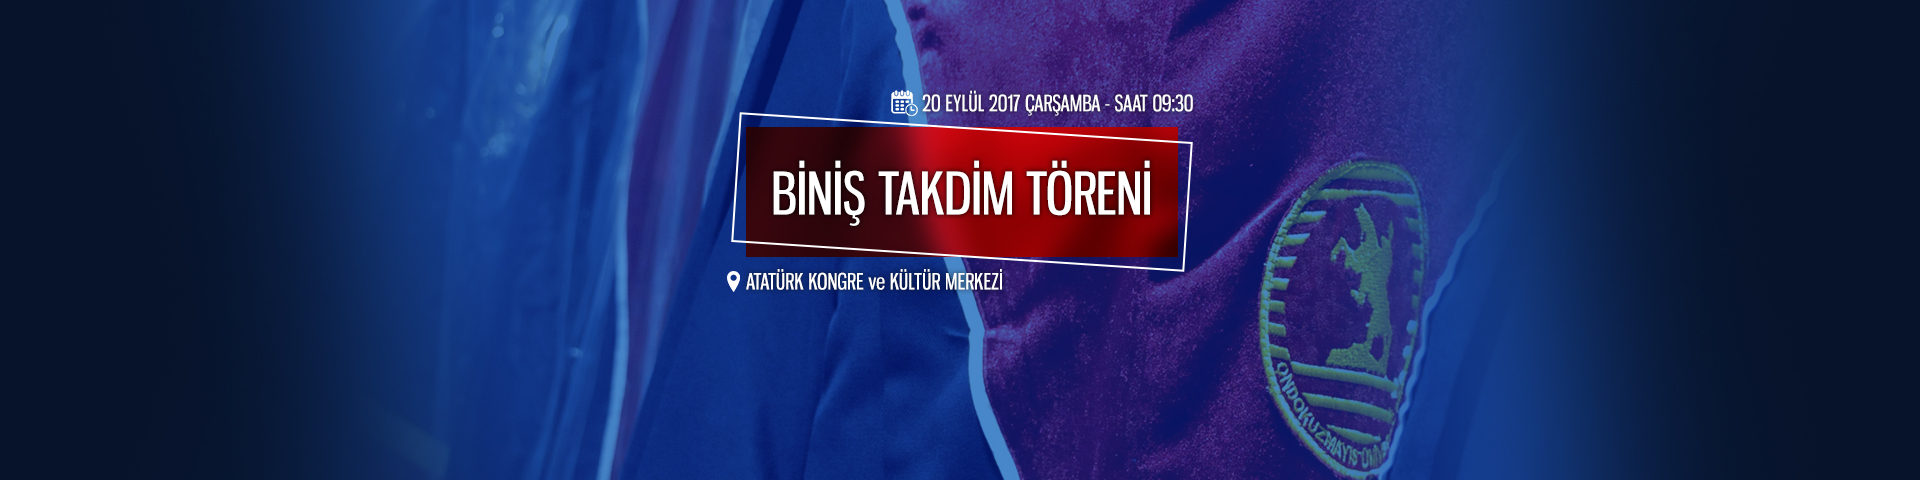 http://www.omu.edu.tr/sites/default/files/files/binis_takdim_toreni/binistakdim-slider.jpg